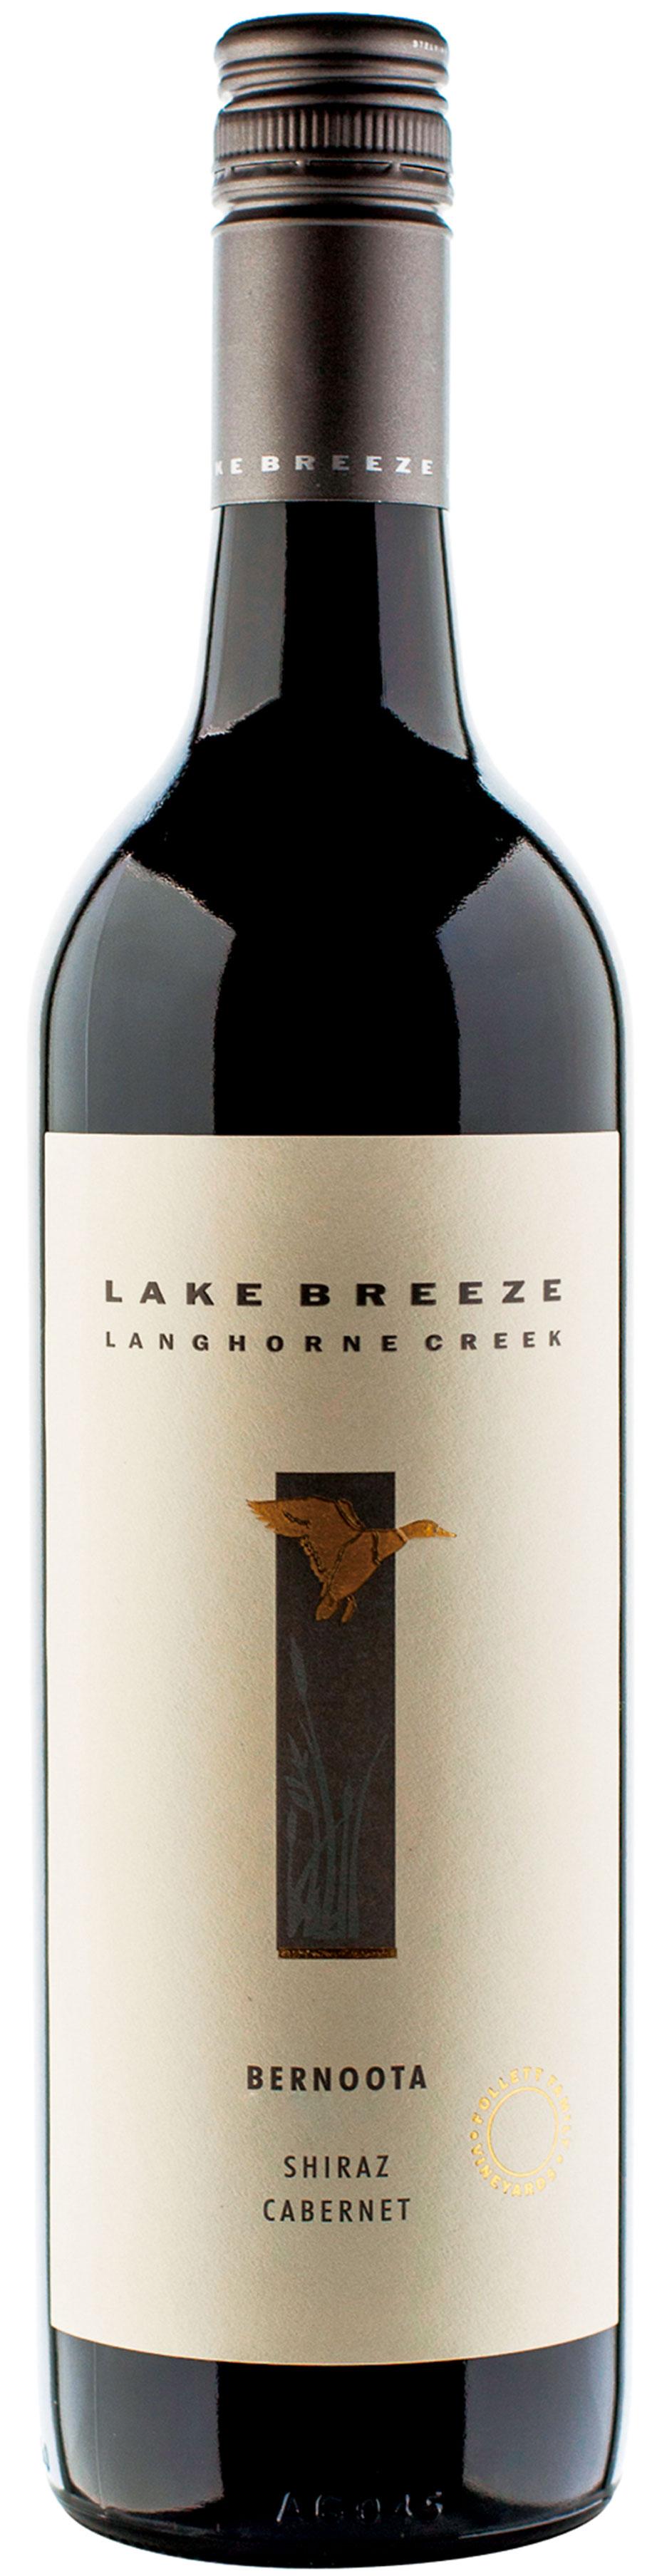 https://vinocorpperu.com/images/vinos/lakebreeze/bernoota_shiraz_60_cabernet_sauvignon_40.jpg